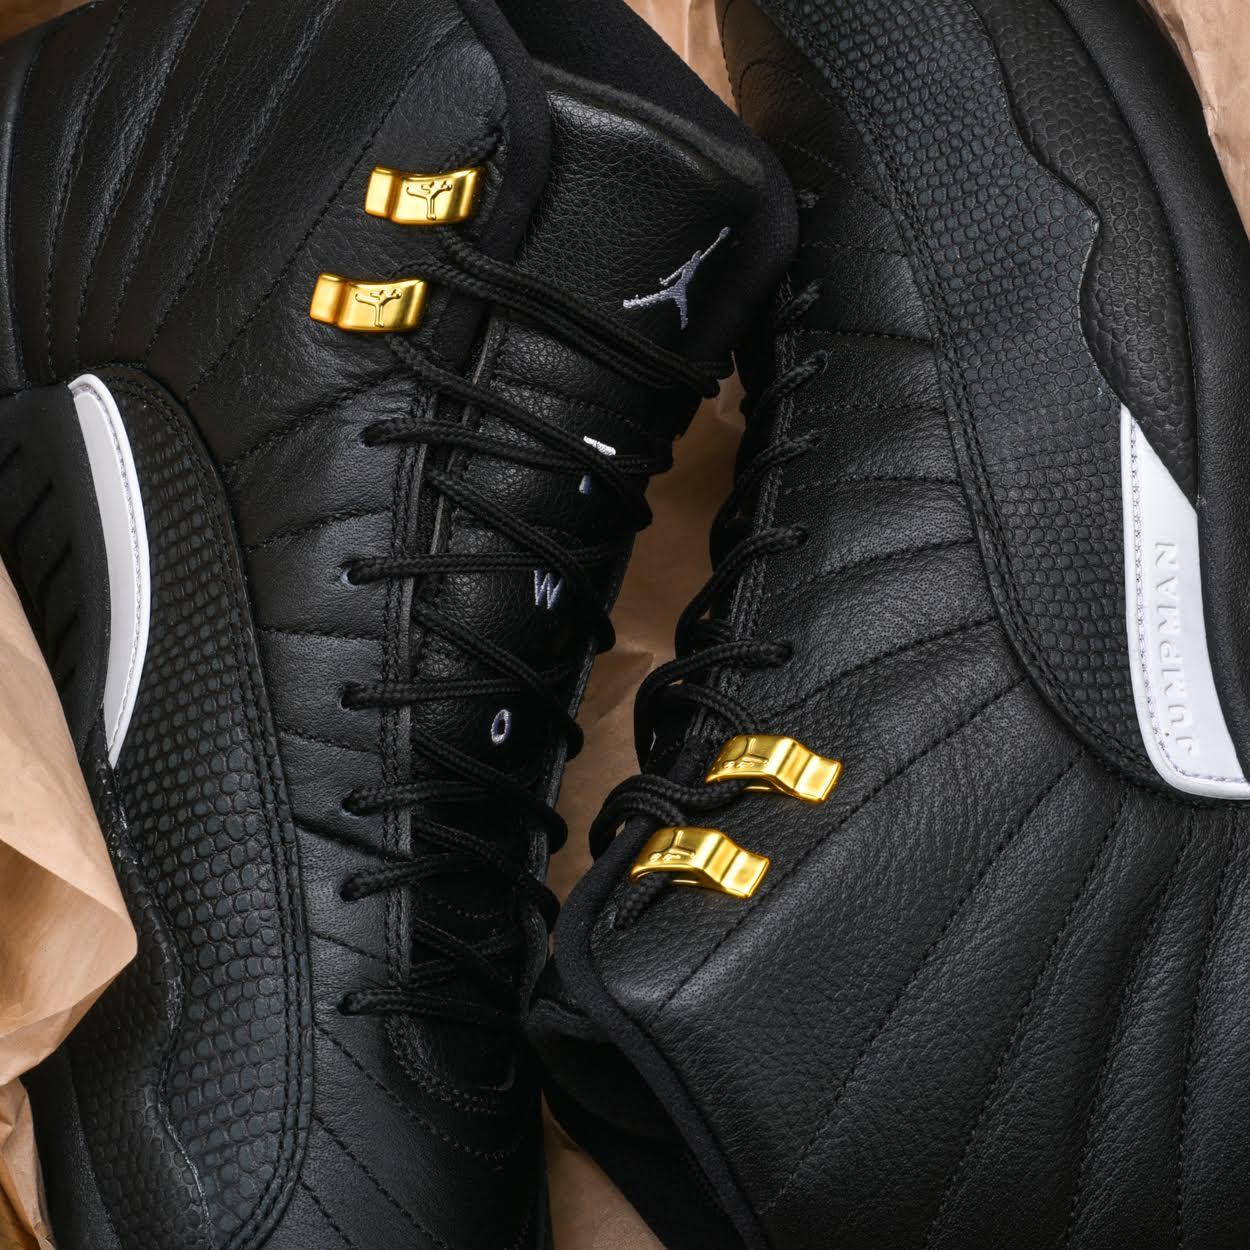 Get One Last Look at the Air Jordan 12 Retro 'The Master' 6